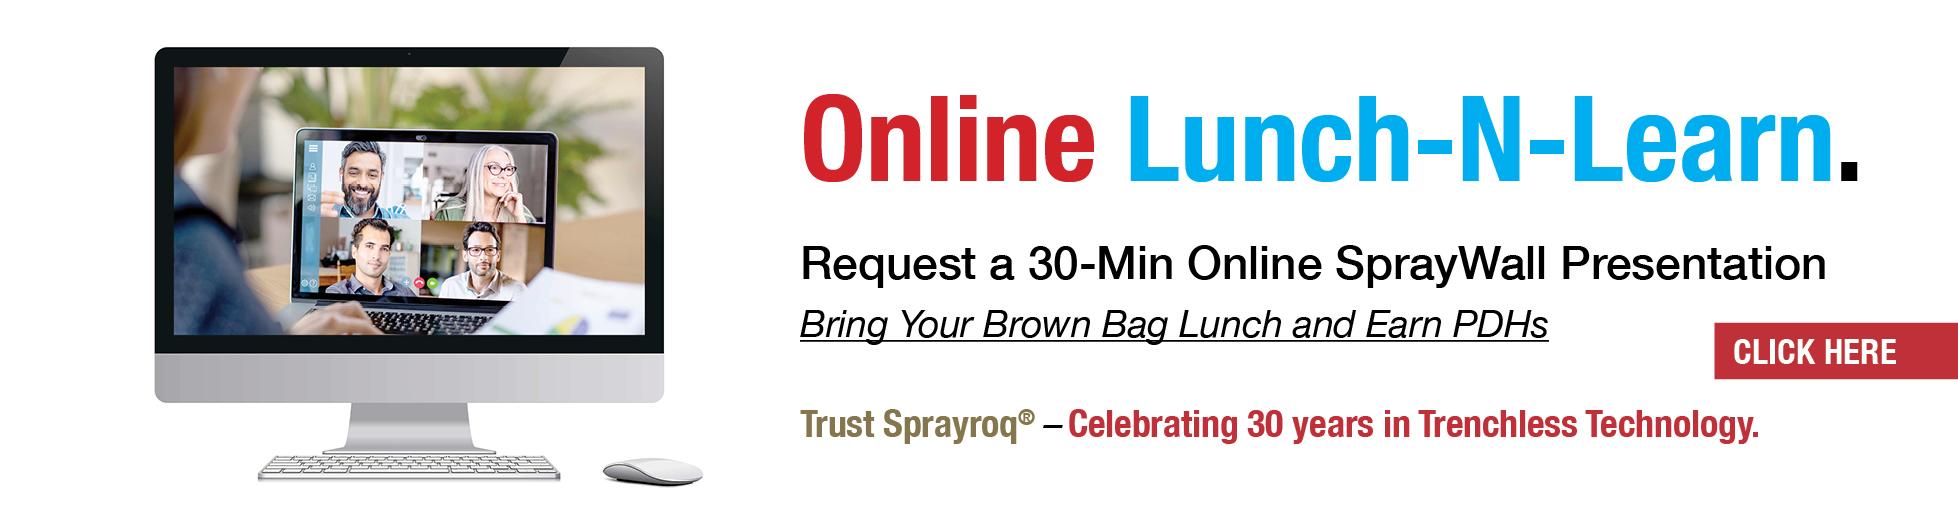 Reserve Your Spot - Online SprayWall Presentation